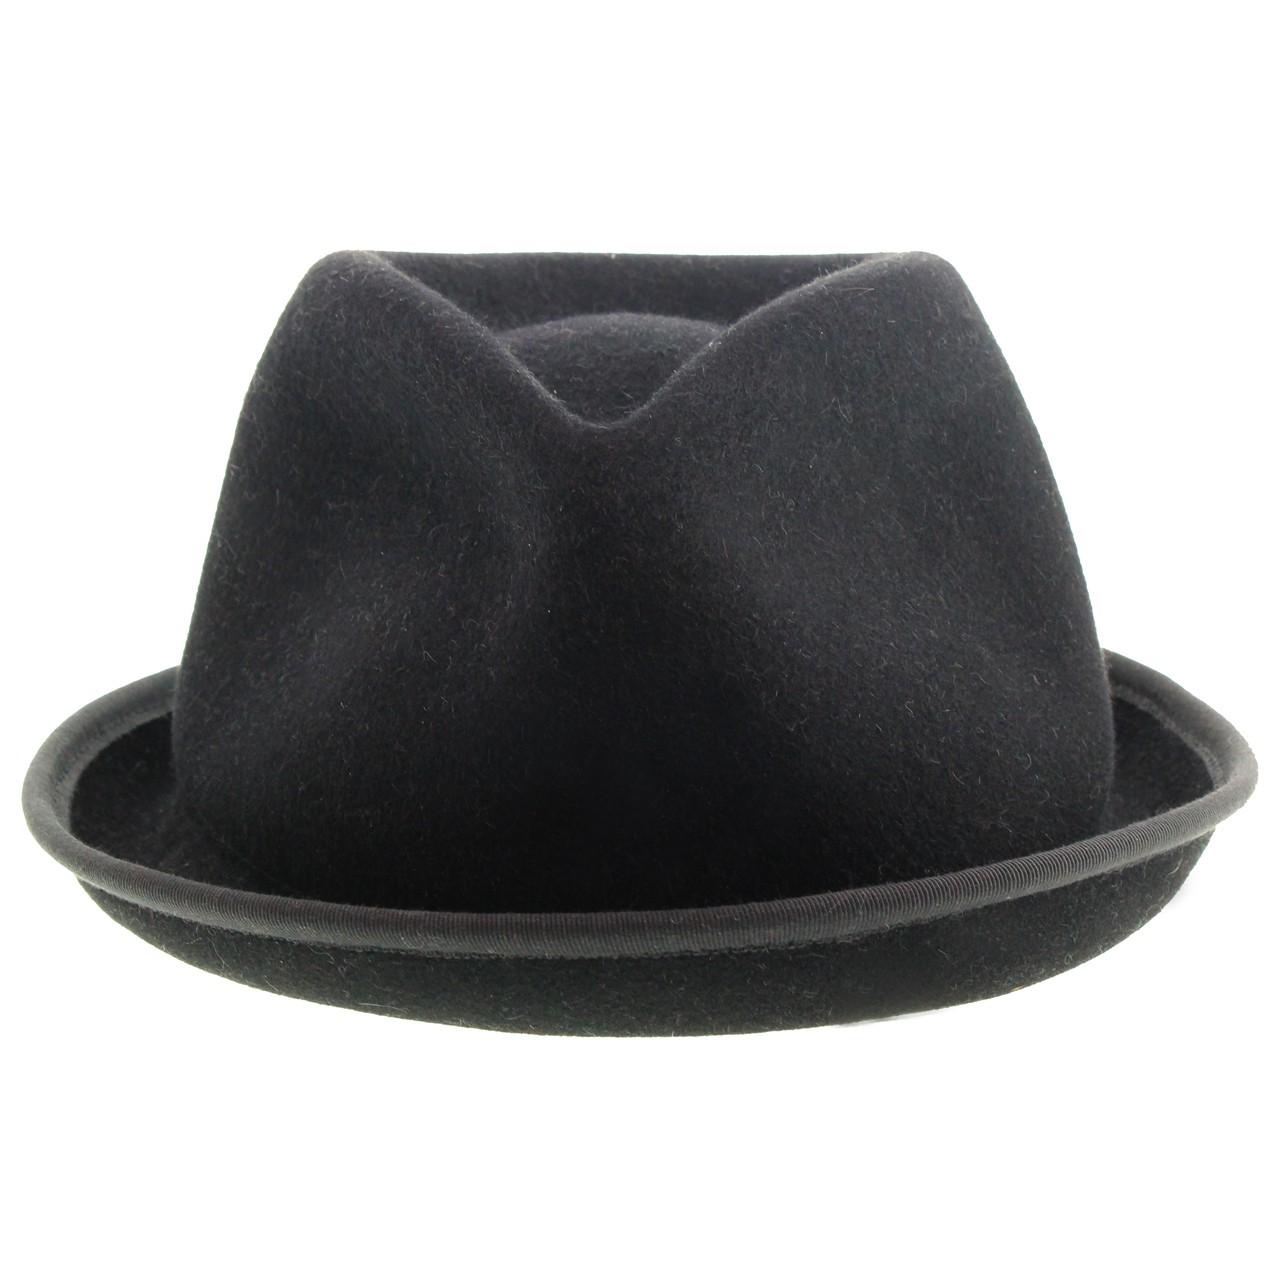 b170ebbc9b987 M43 Men s Felt Fedora Short Brim Hat